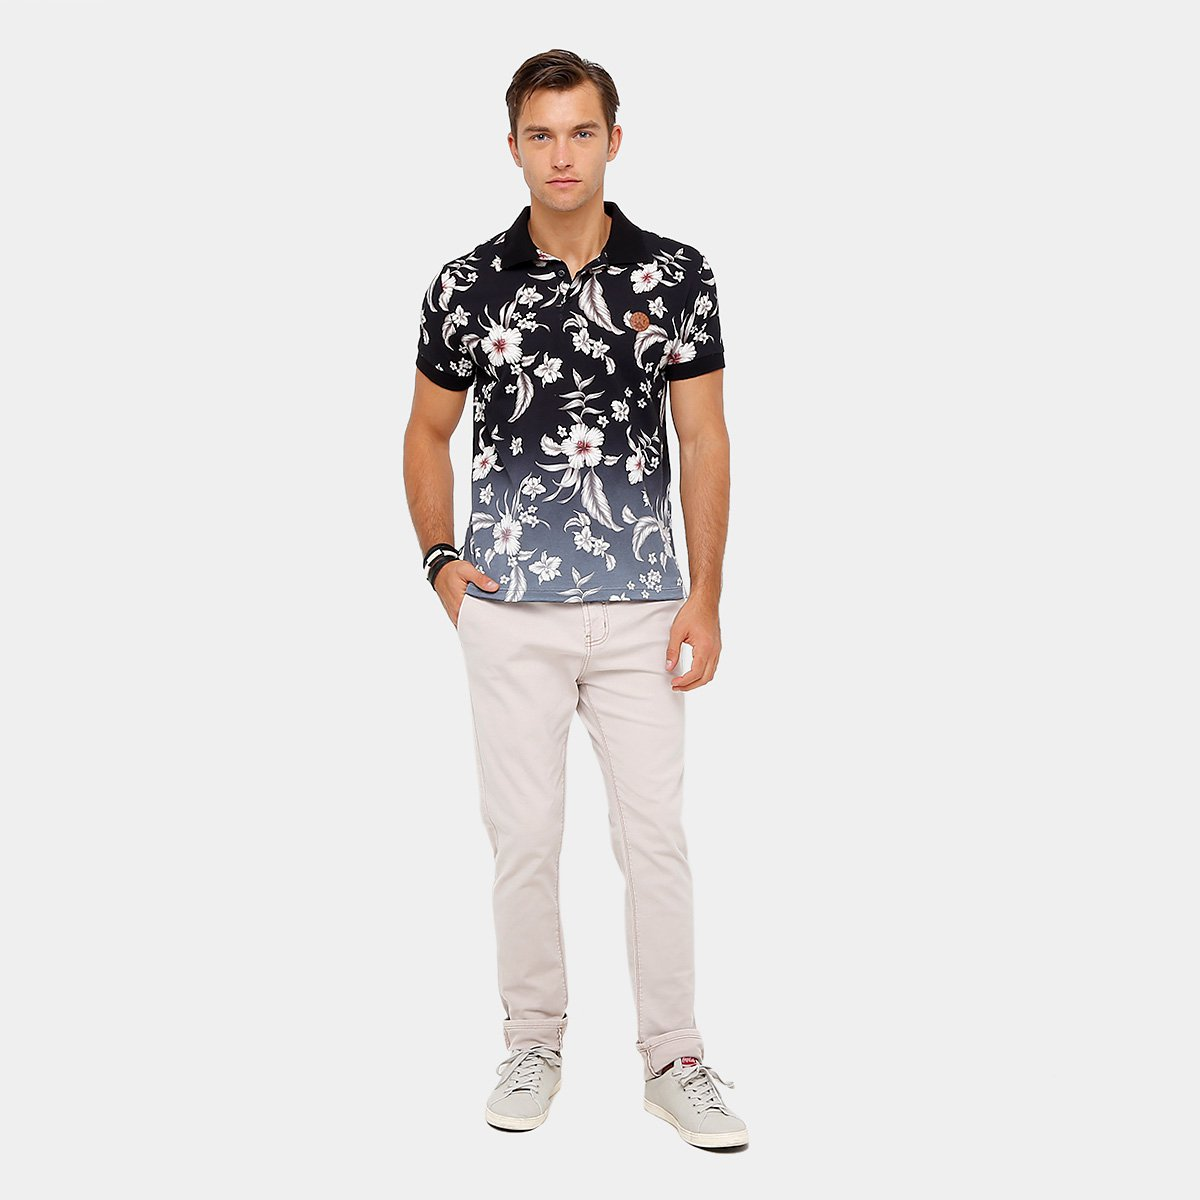 3a9abf8538 ... Camisa Polo Sommer Malha Full Print Flower Degradê Masculina ...